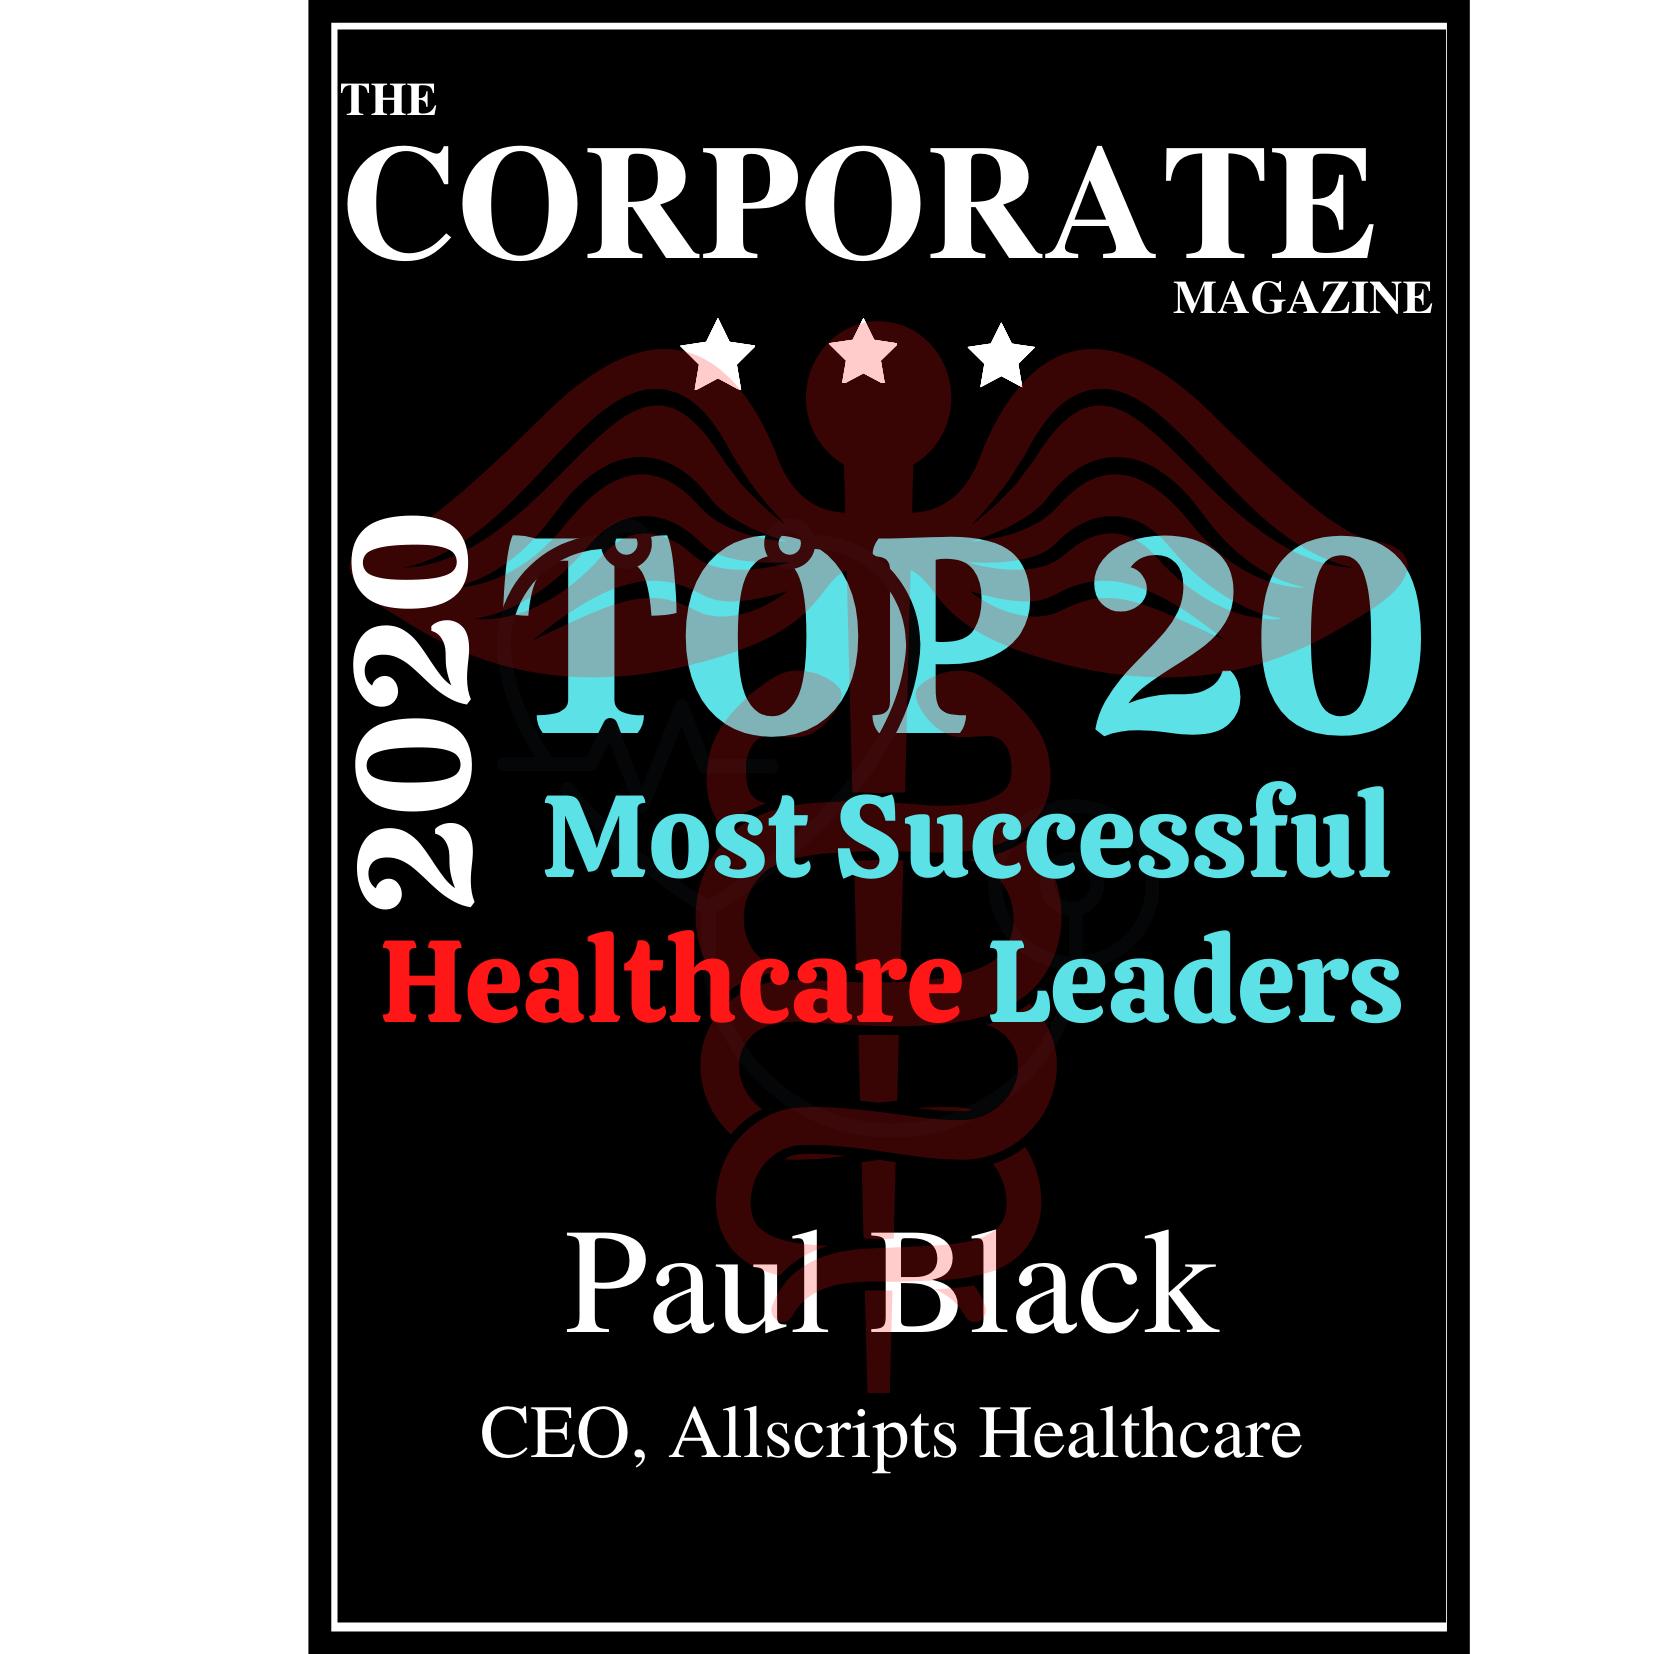 Paul Black Best Healthcare Magazine